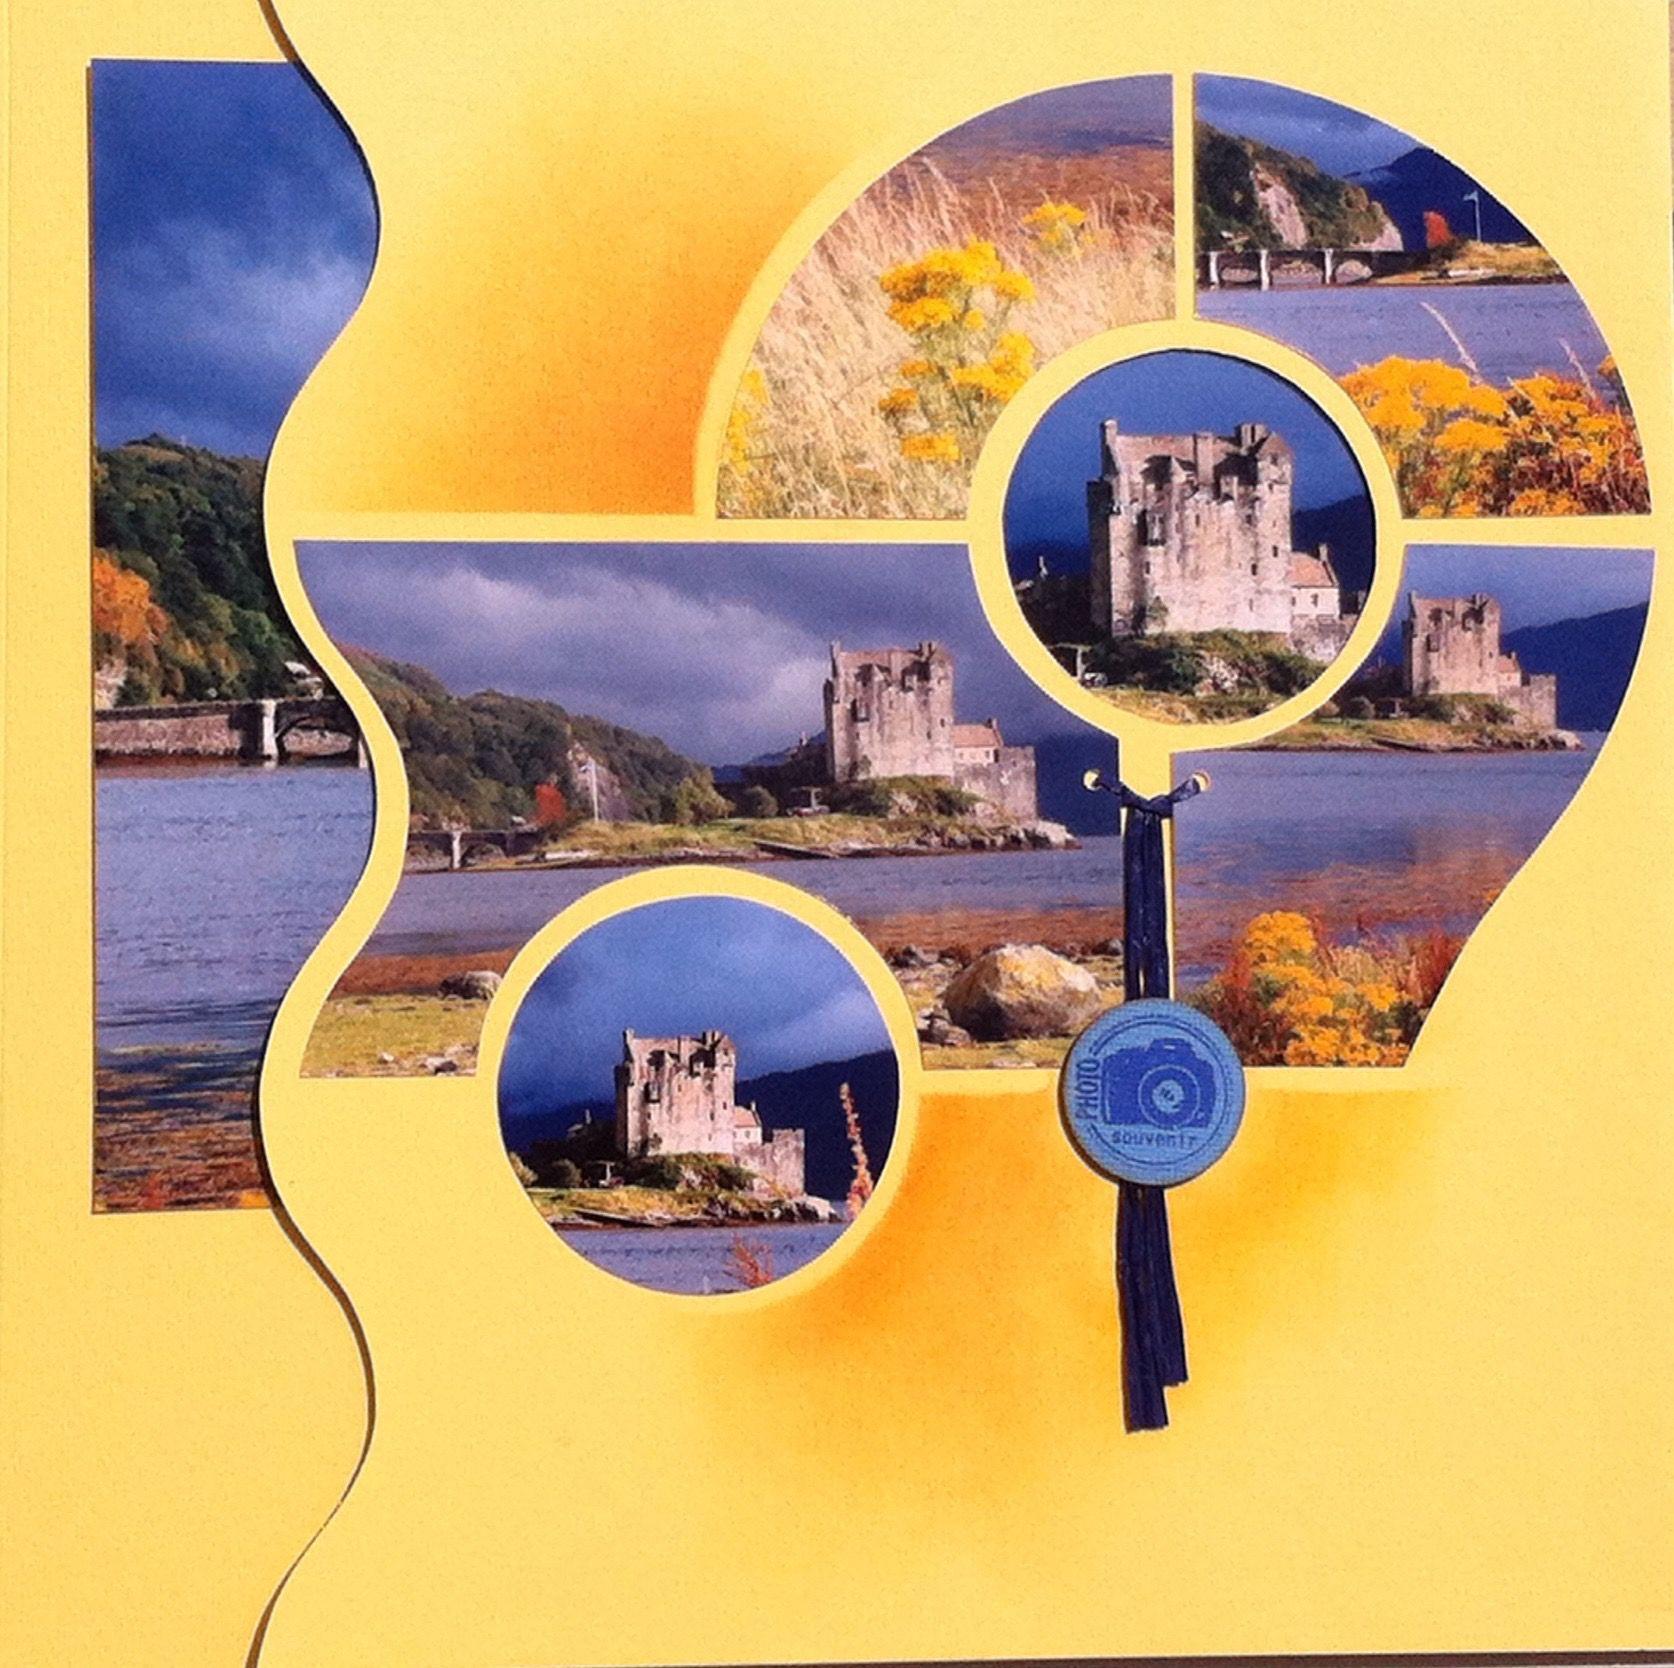 Gabarit Azza Double Page Ecosse Eilean Donan Castle Photobook Layout Photo Book Scrapbook Templates